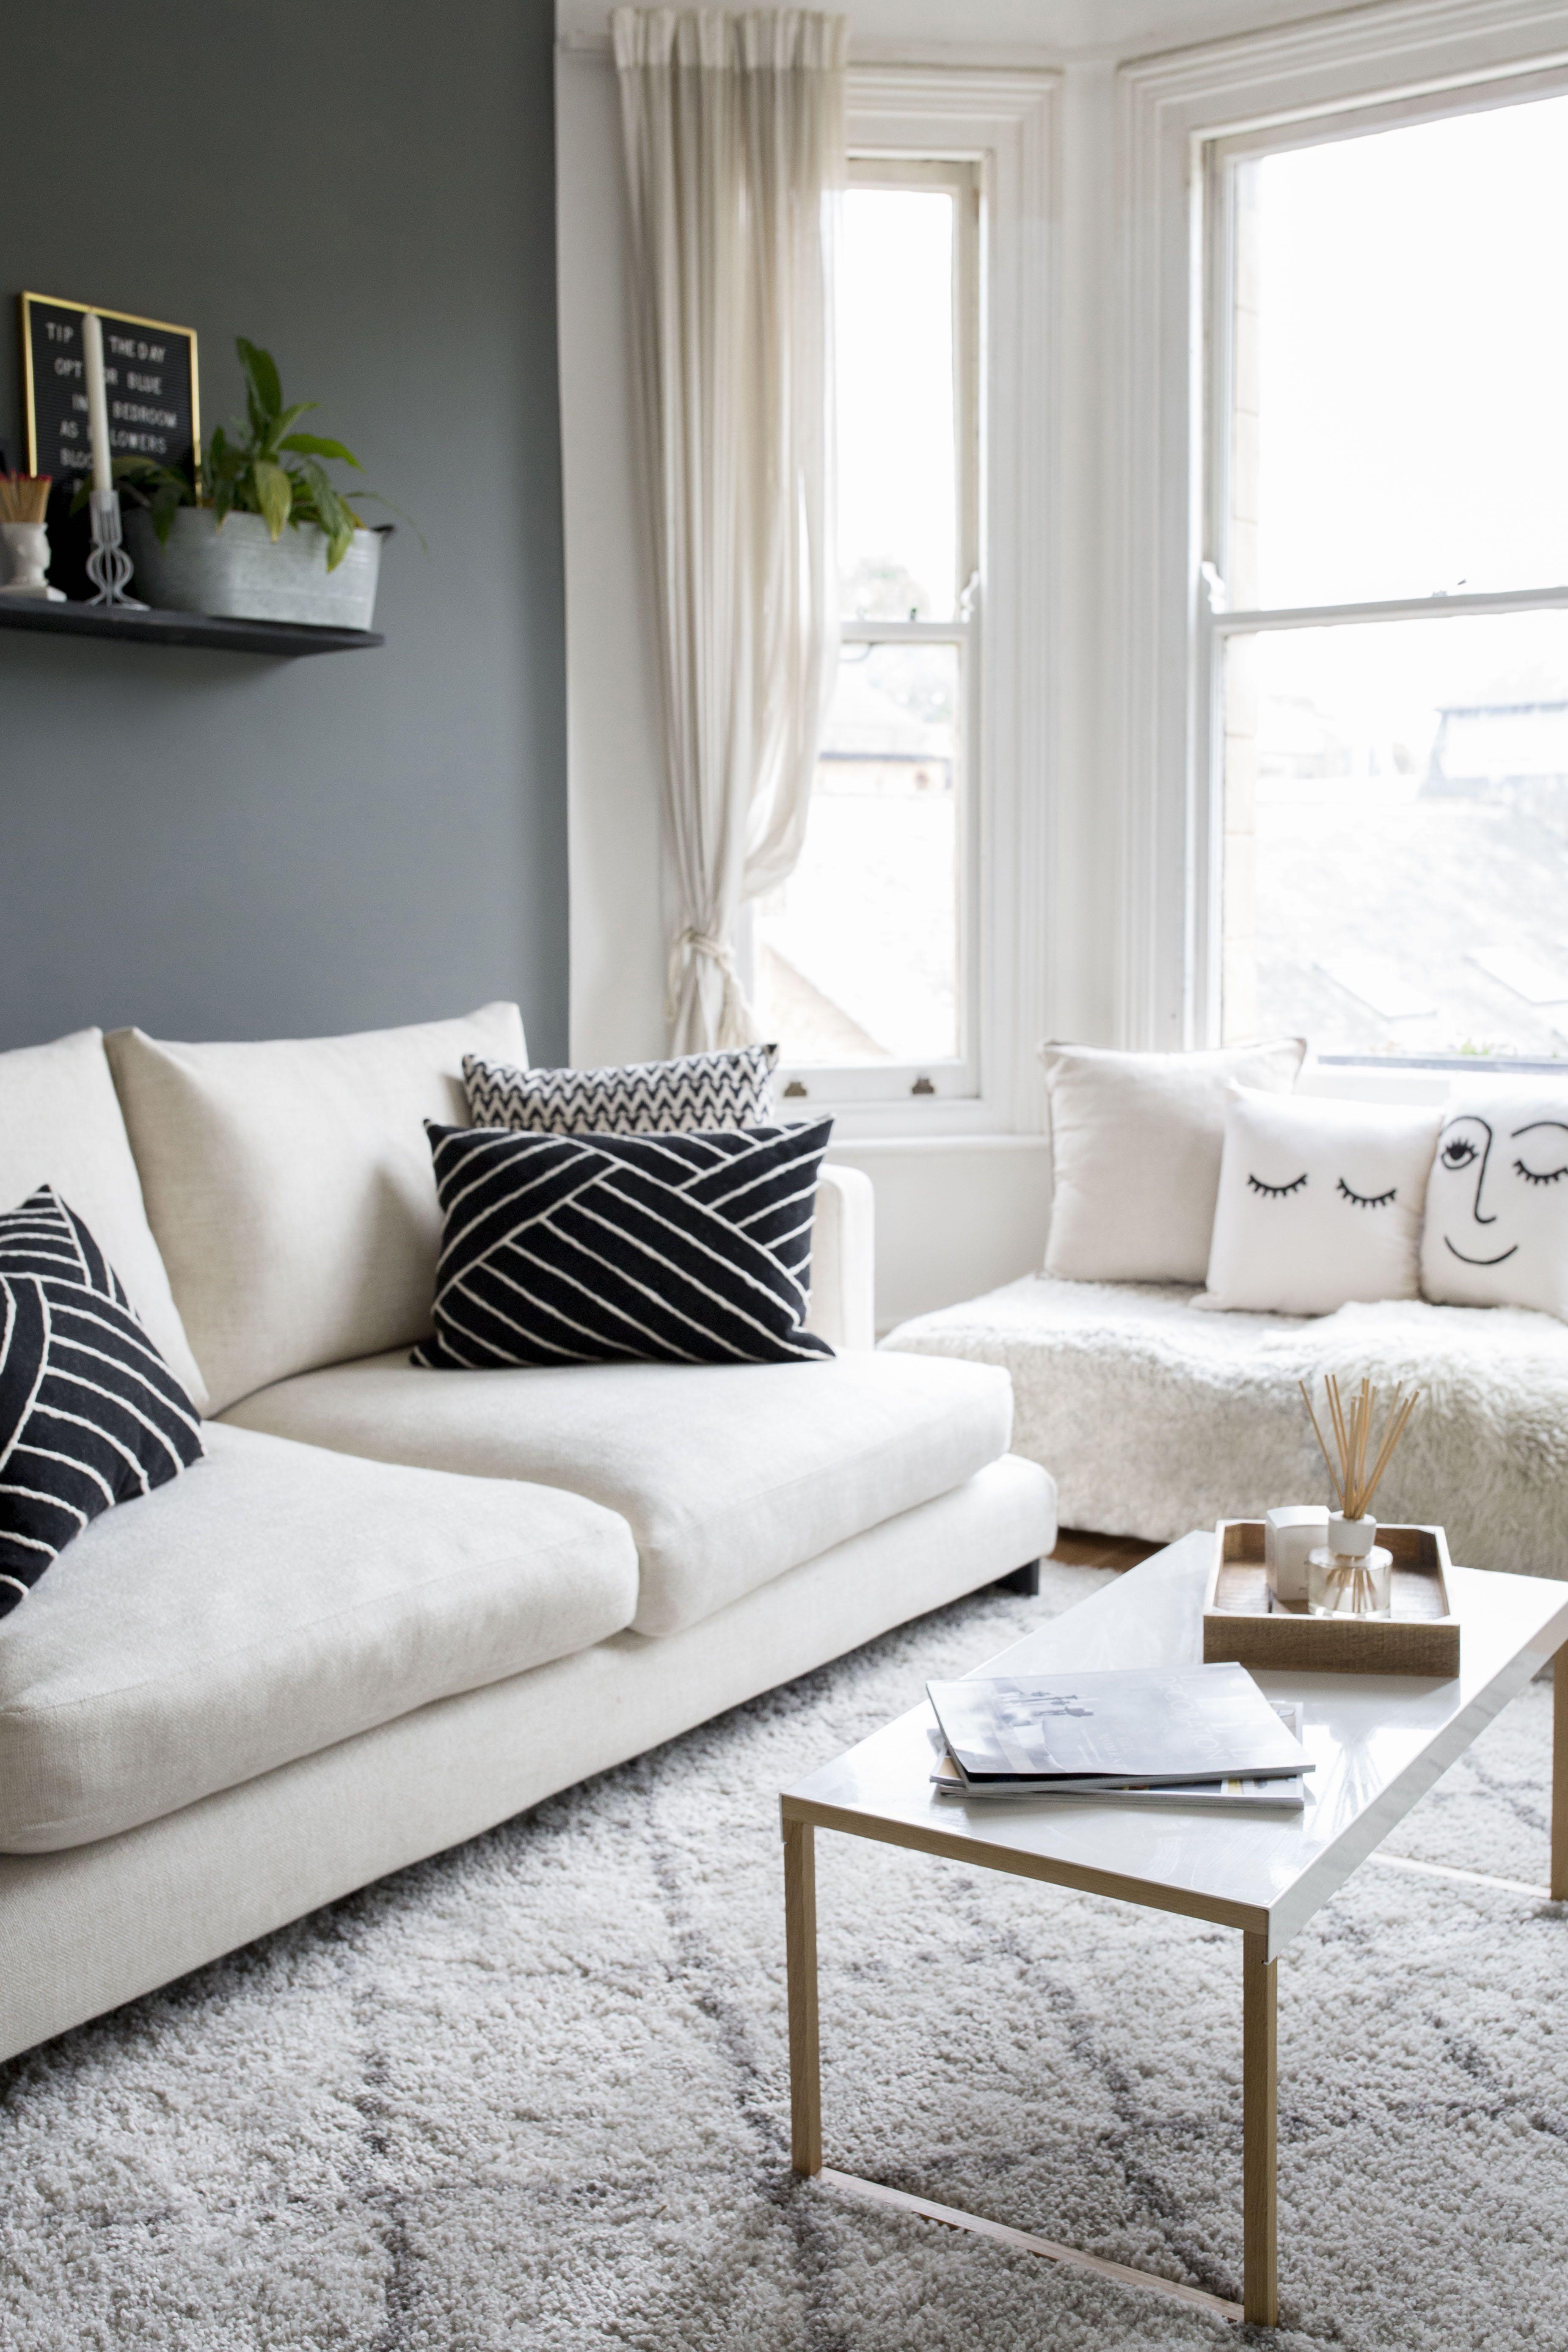 interior photography tips